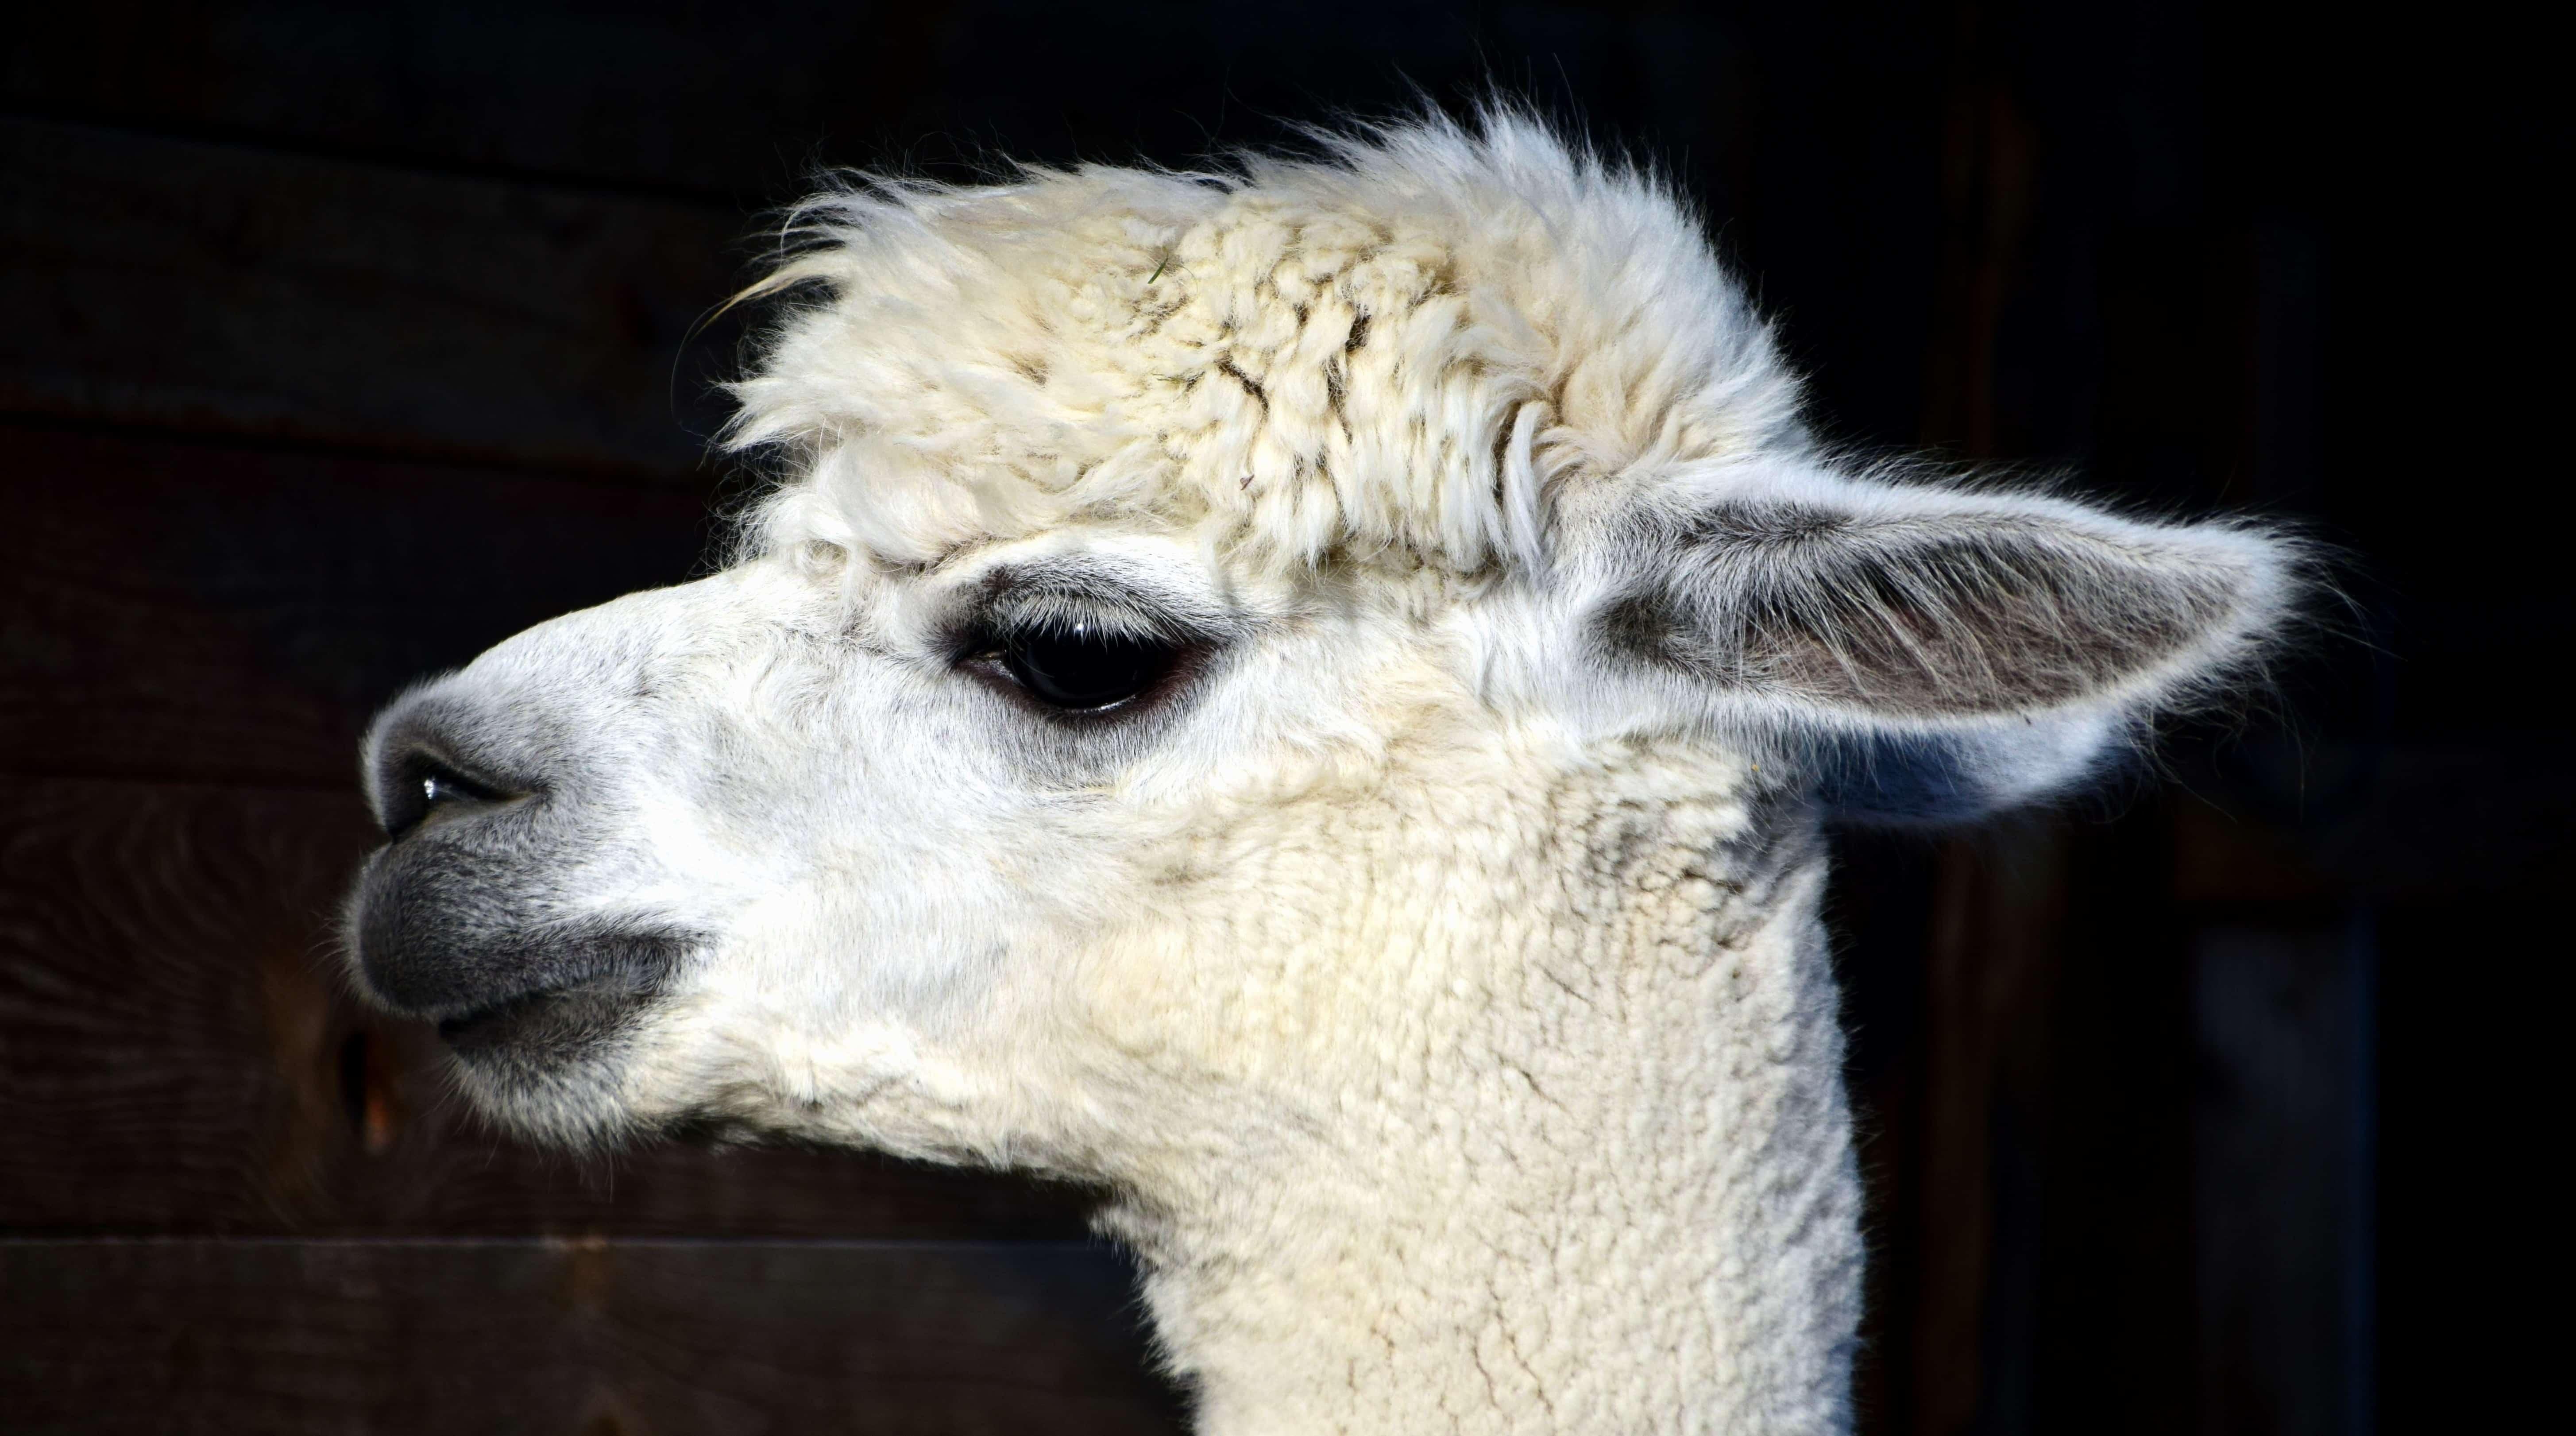 free picture  llama  white  wildlife  head  fur  animal